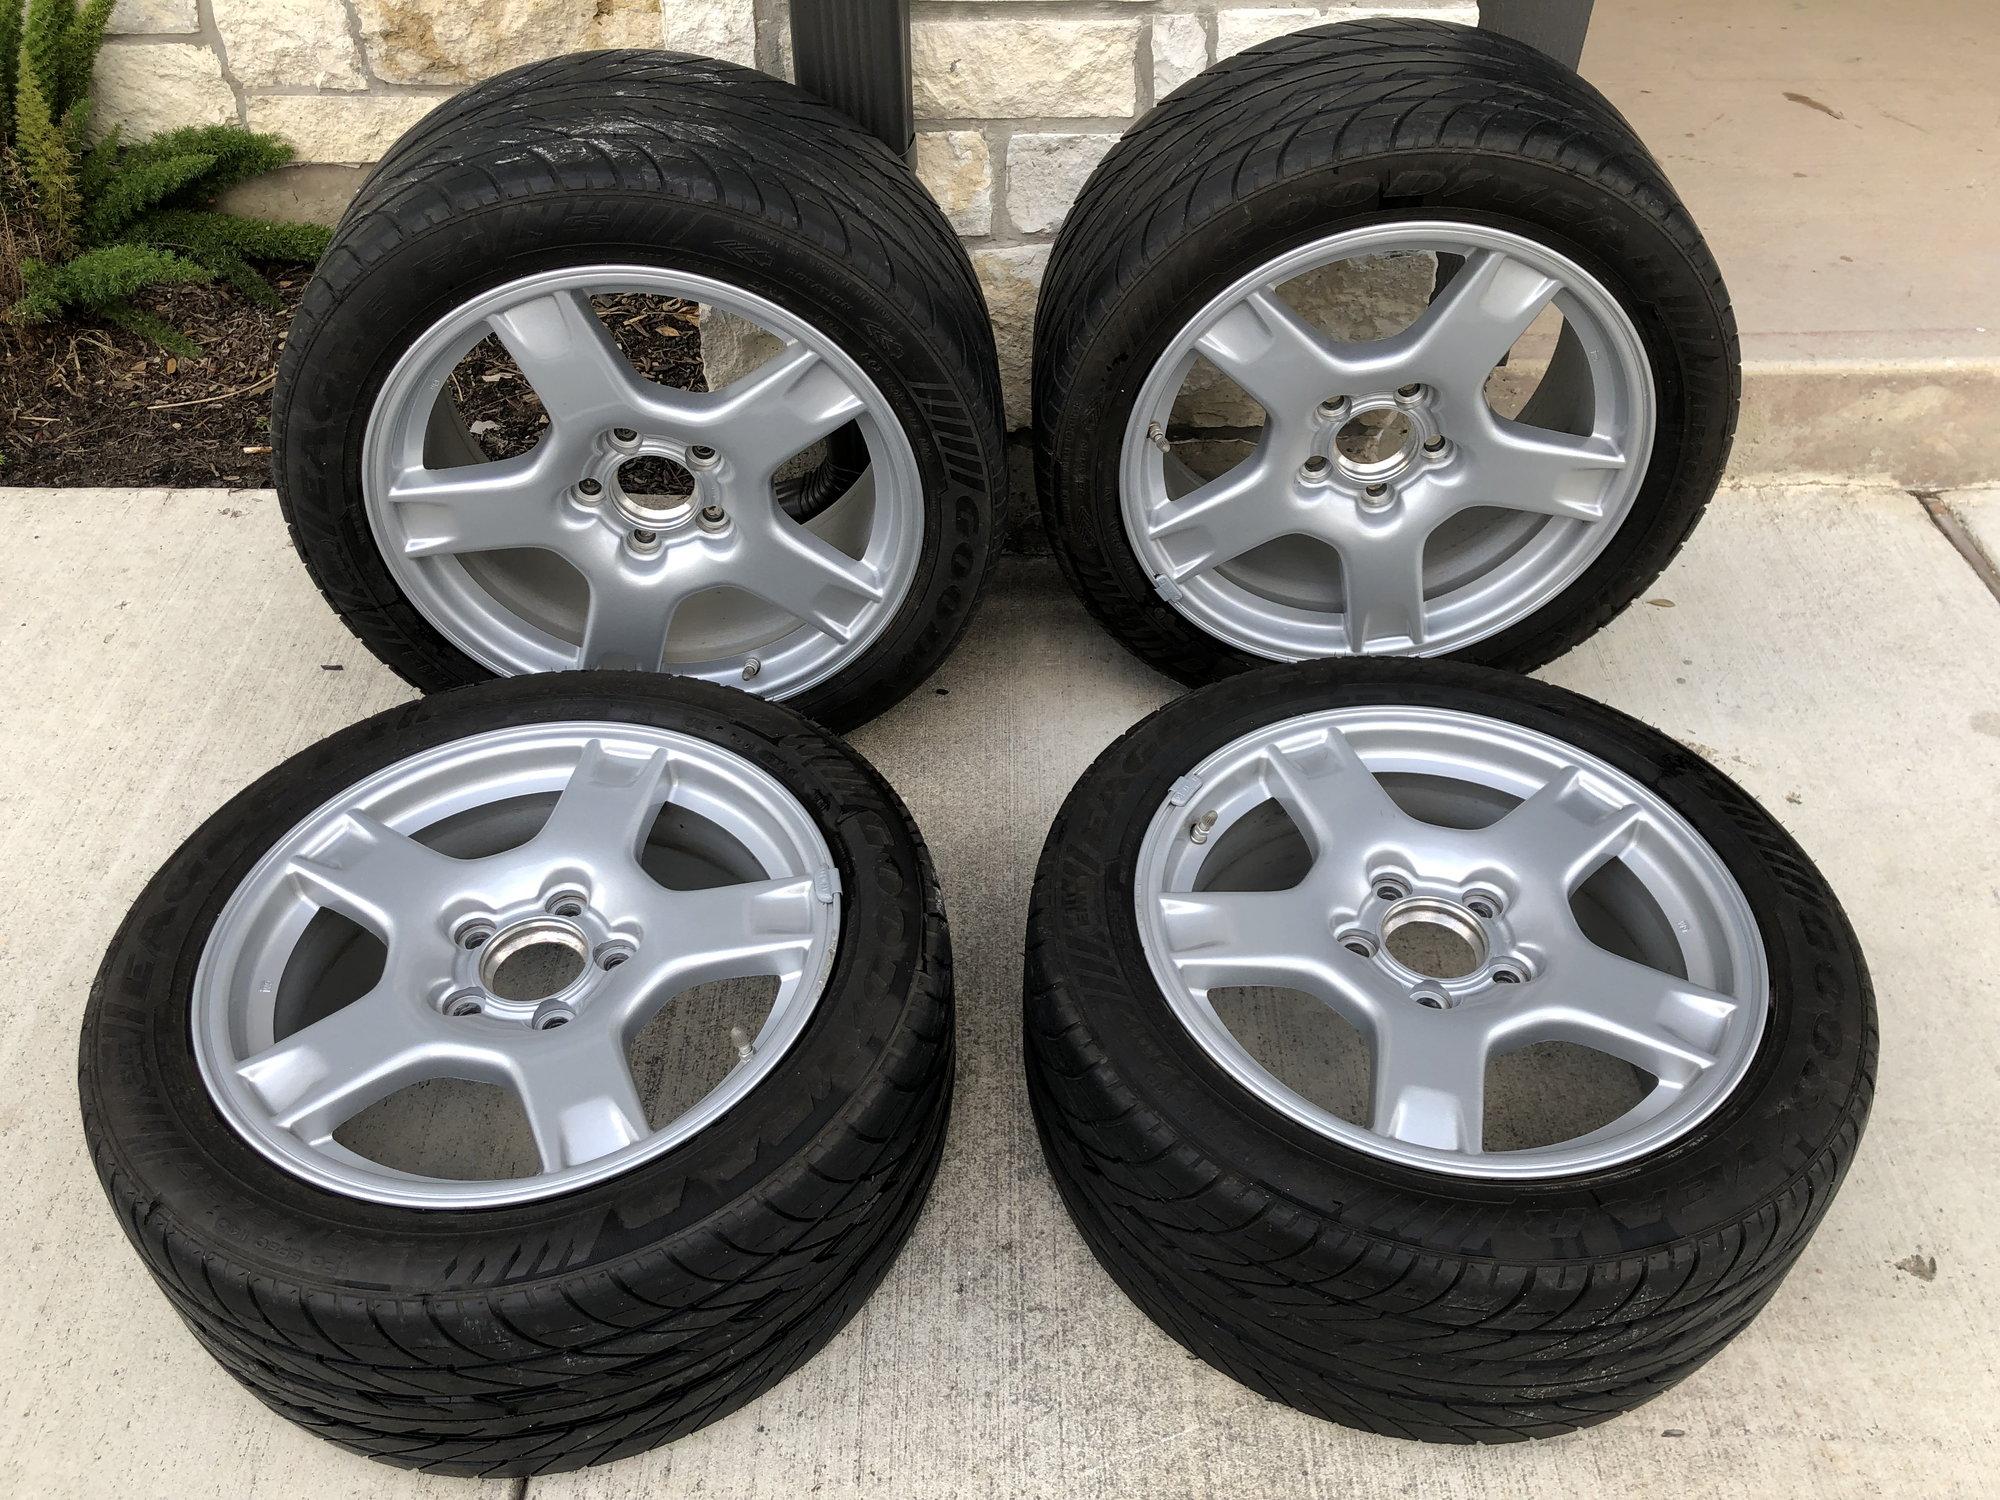 FS (For Sale) Selling Wagon Wheels - San Antonio